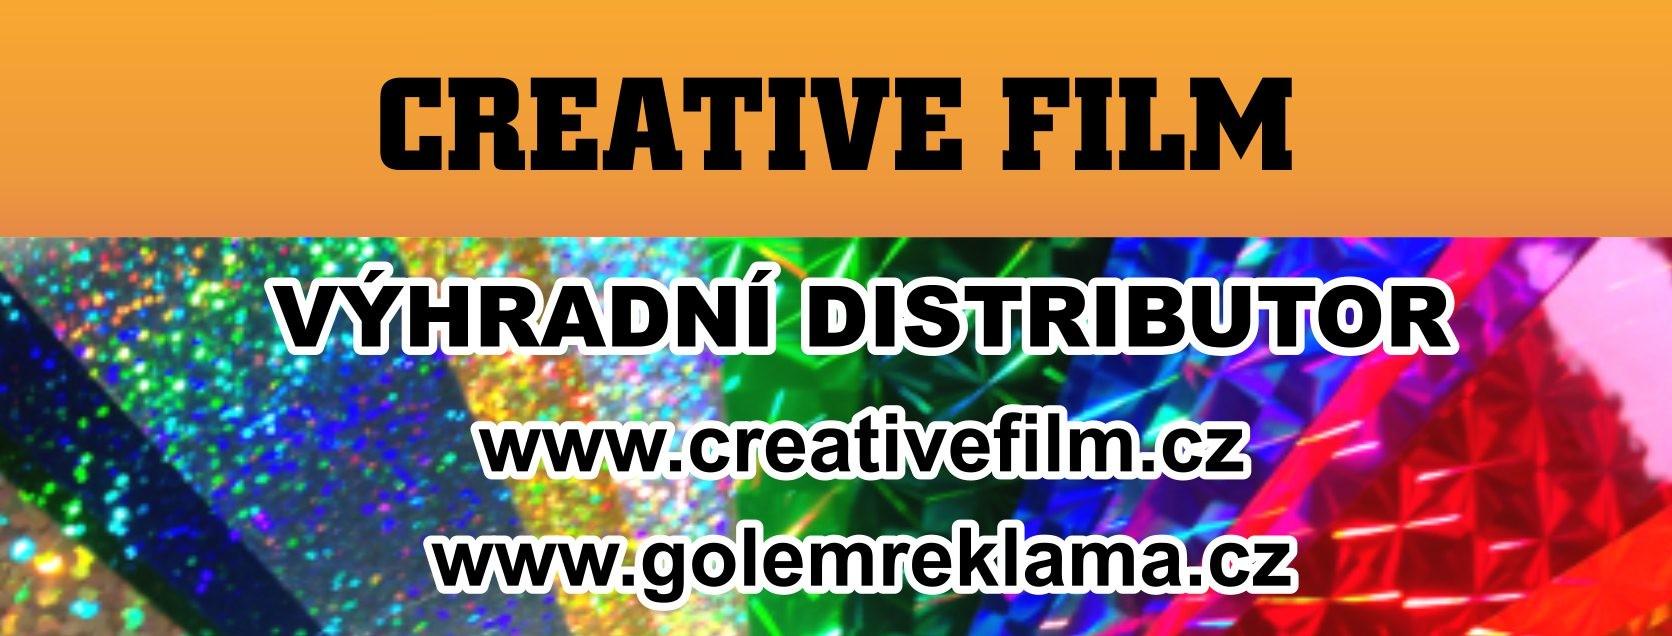 Golem Reklama je distributorem folií CREATIVE